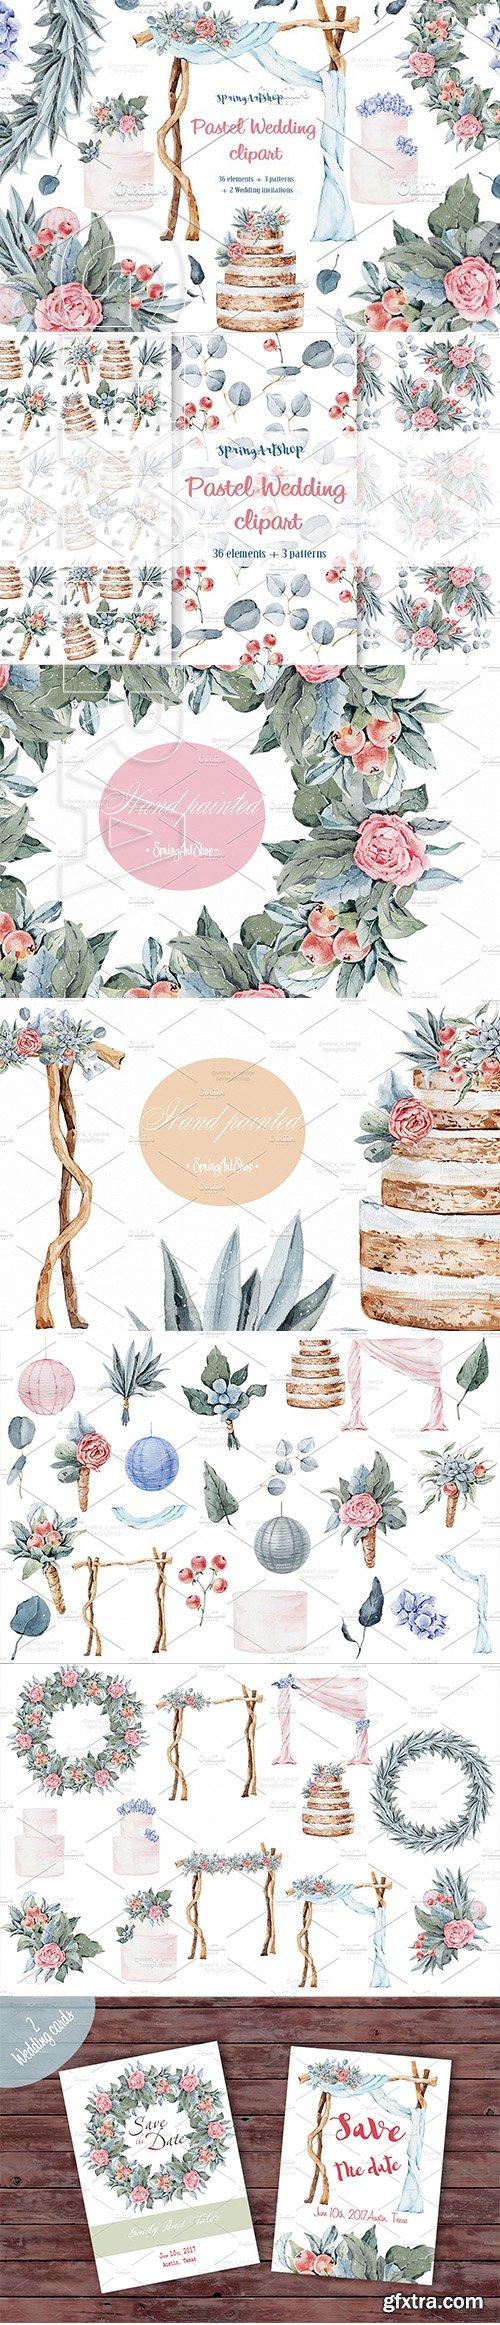 CreativeMarket - Pastel wedding watercolor clipart 1522384